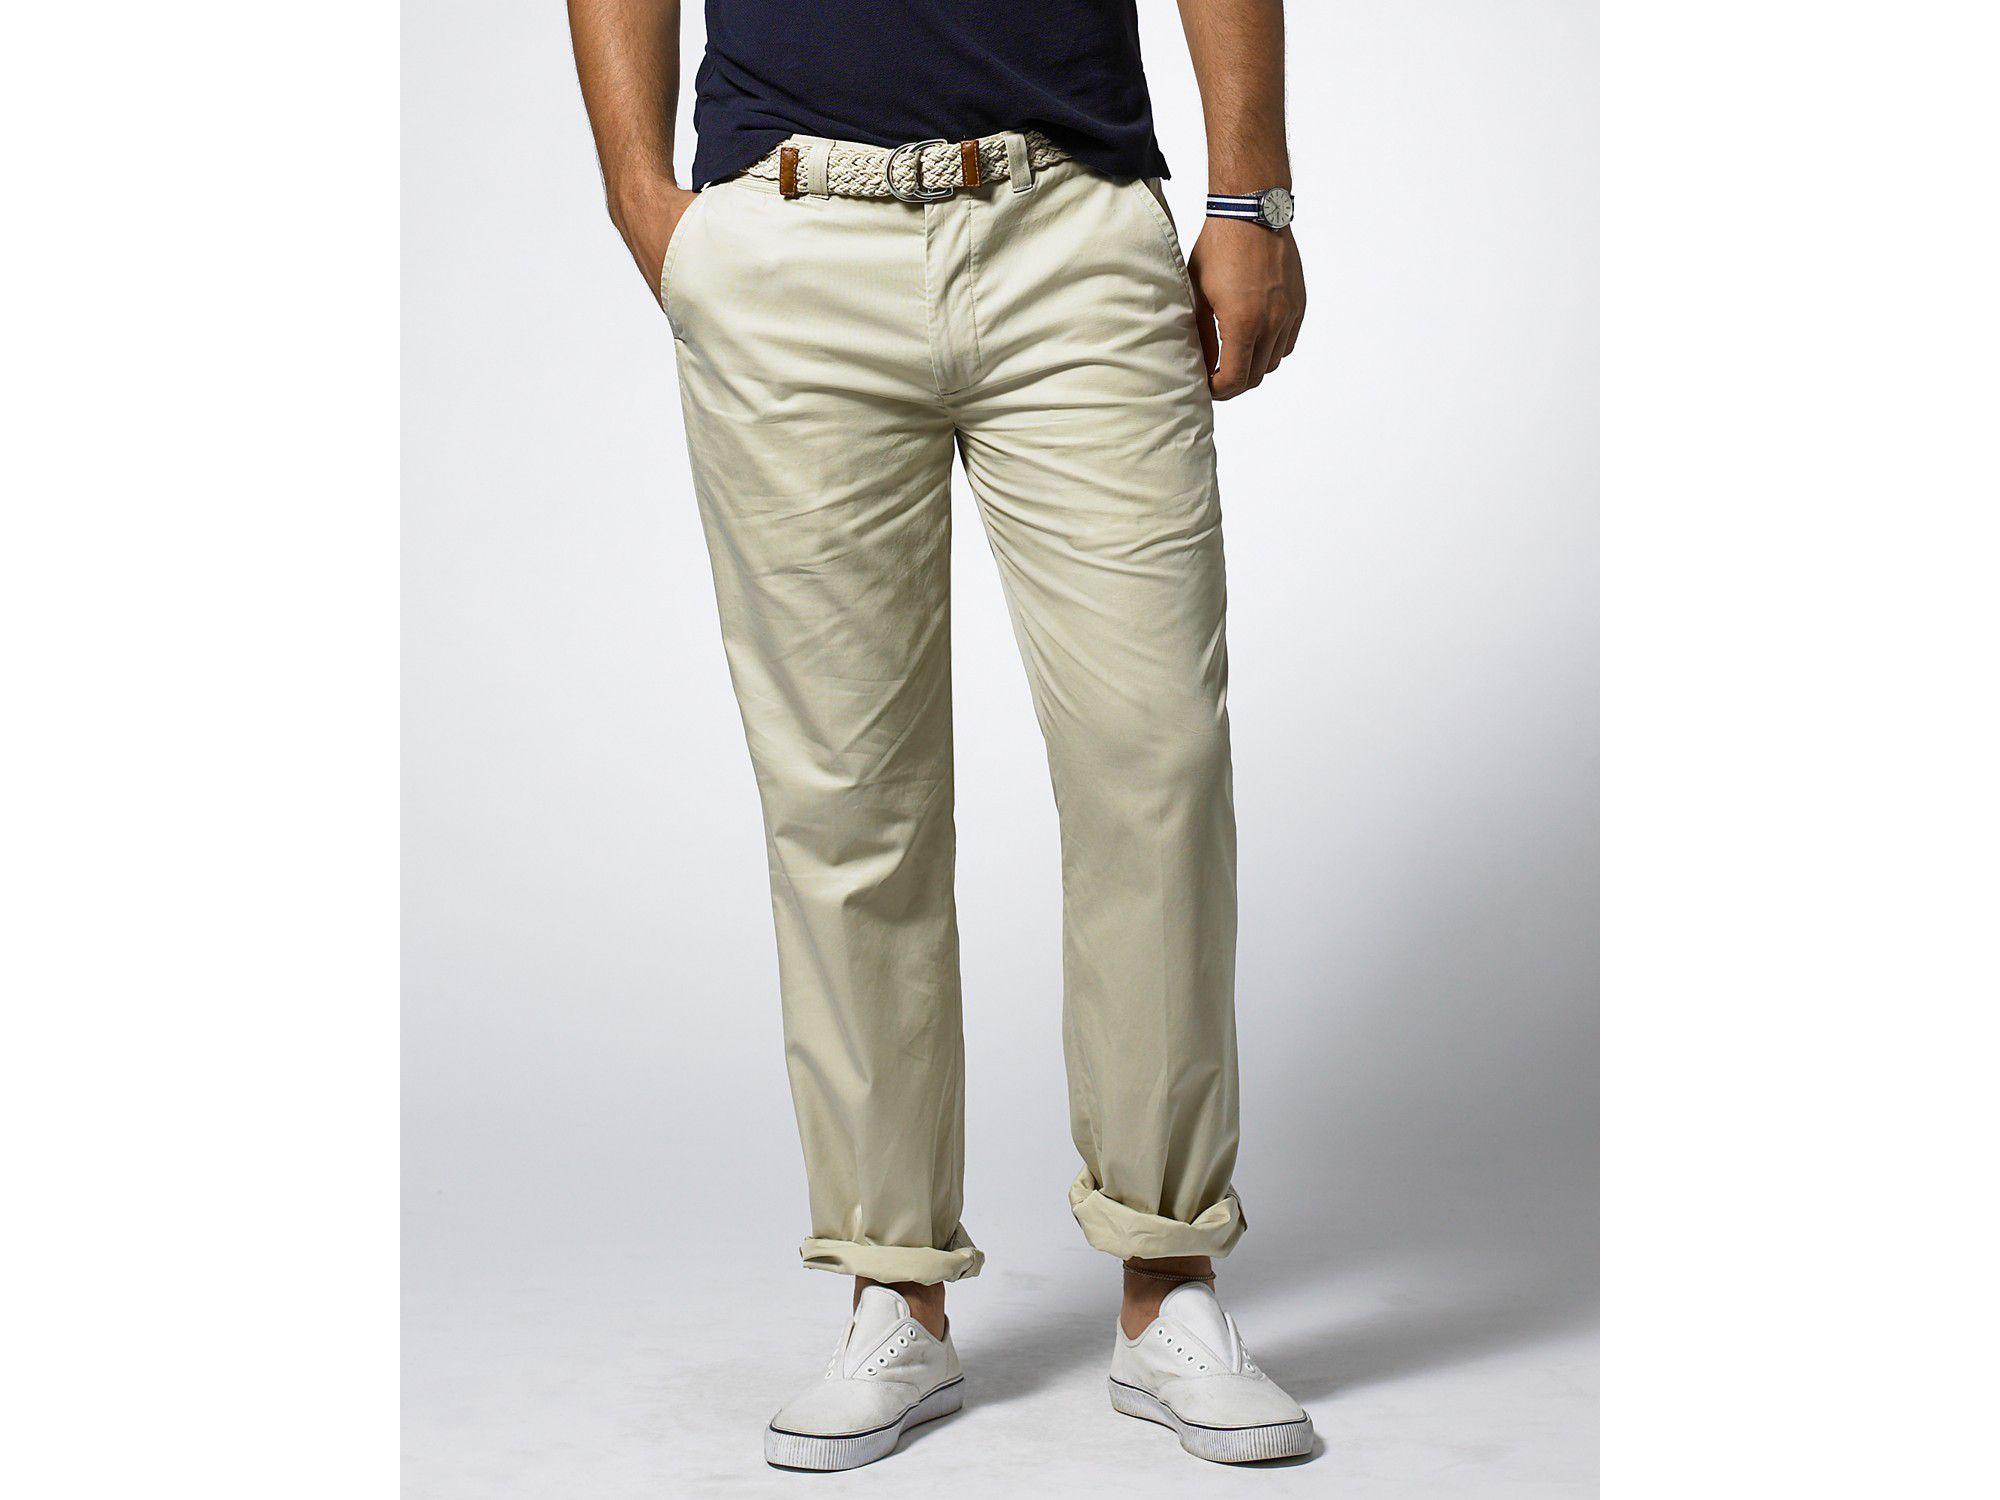 Hajotrawa Boys Pull On Waist Sweatpants Harem Casual Strings Jogging Pants